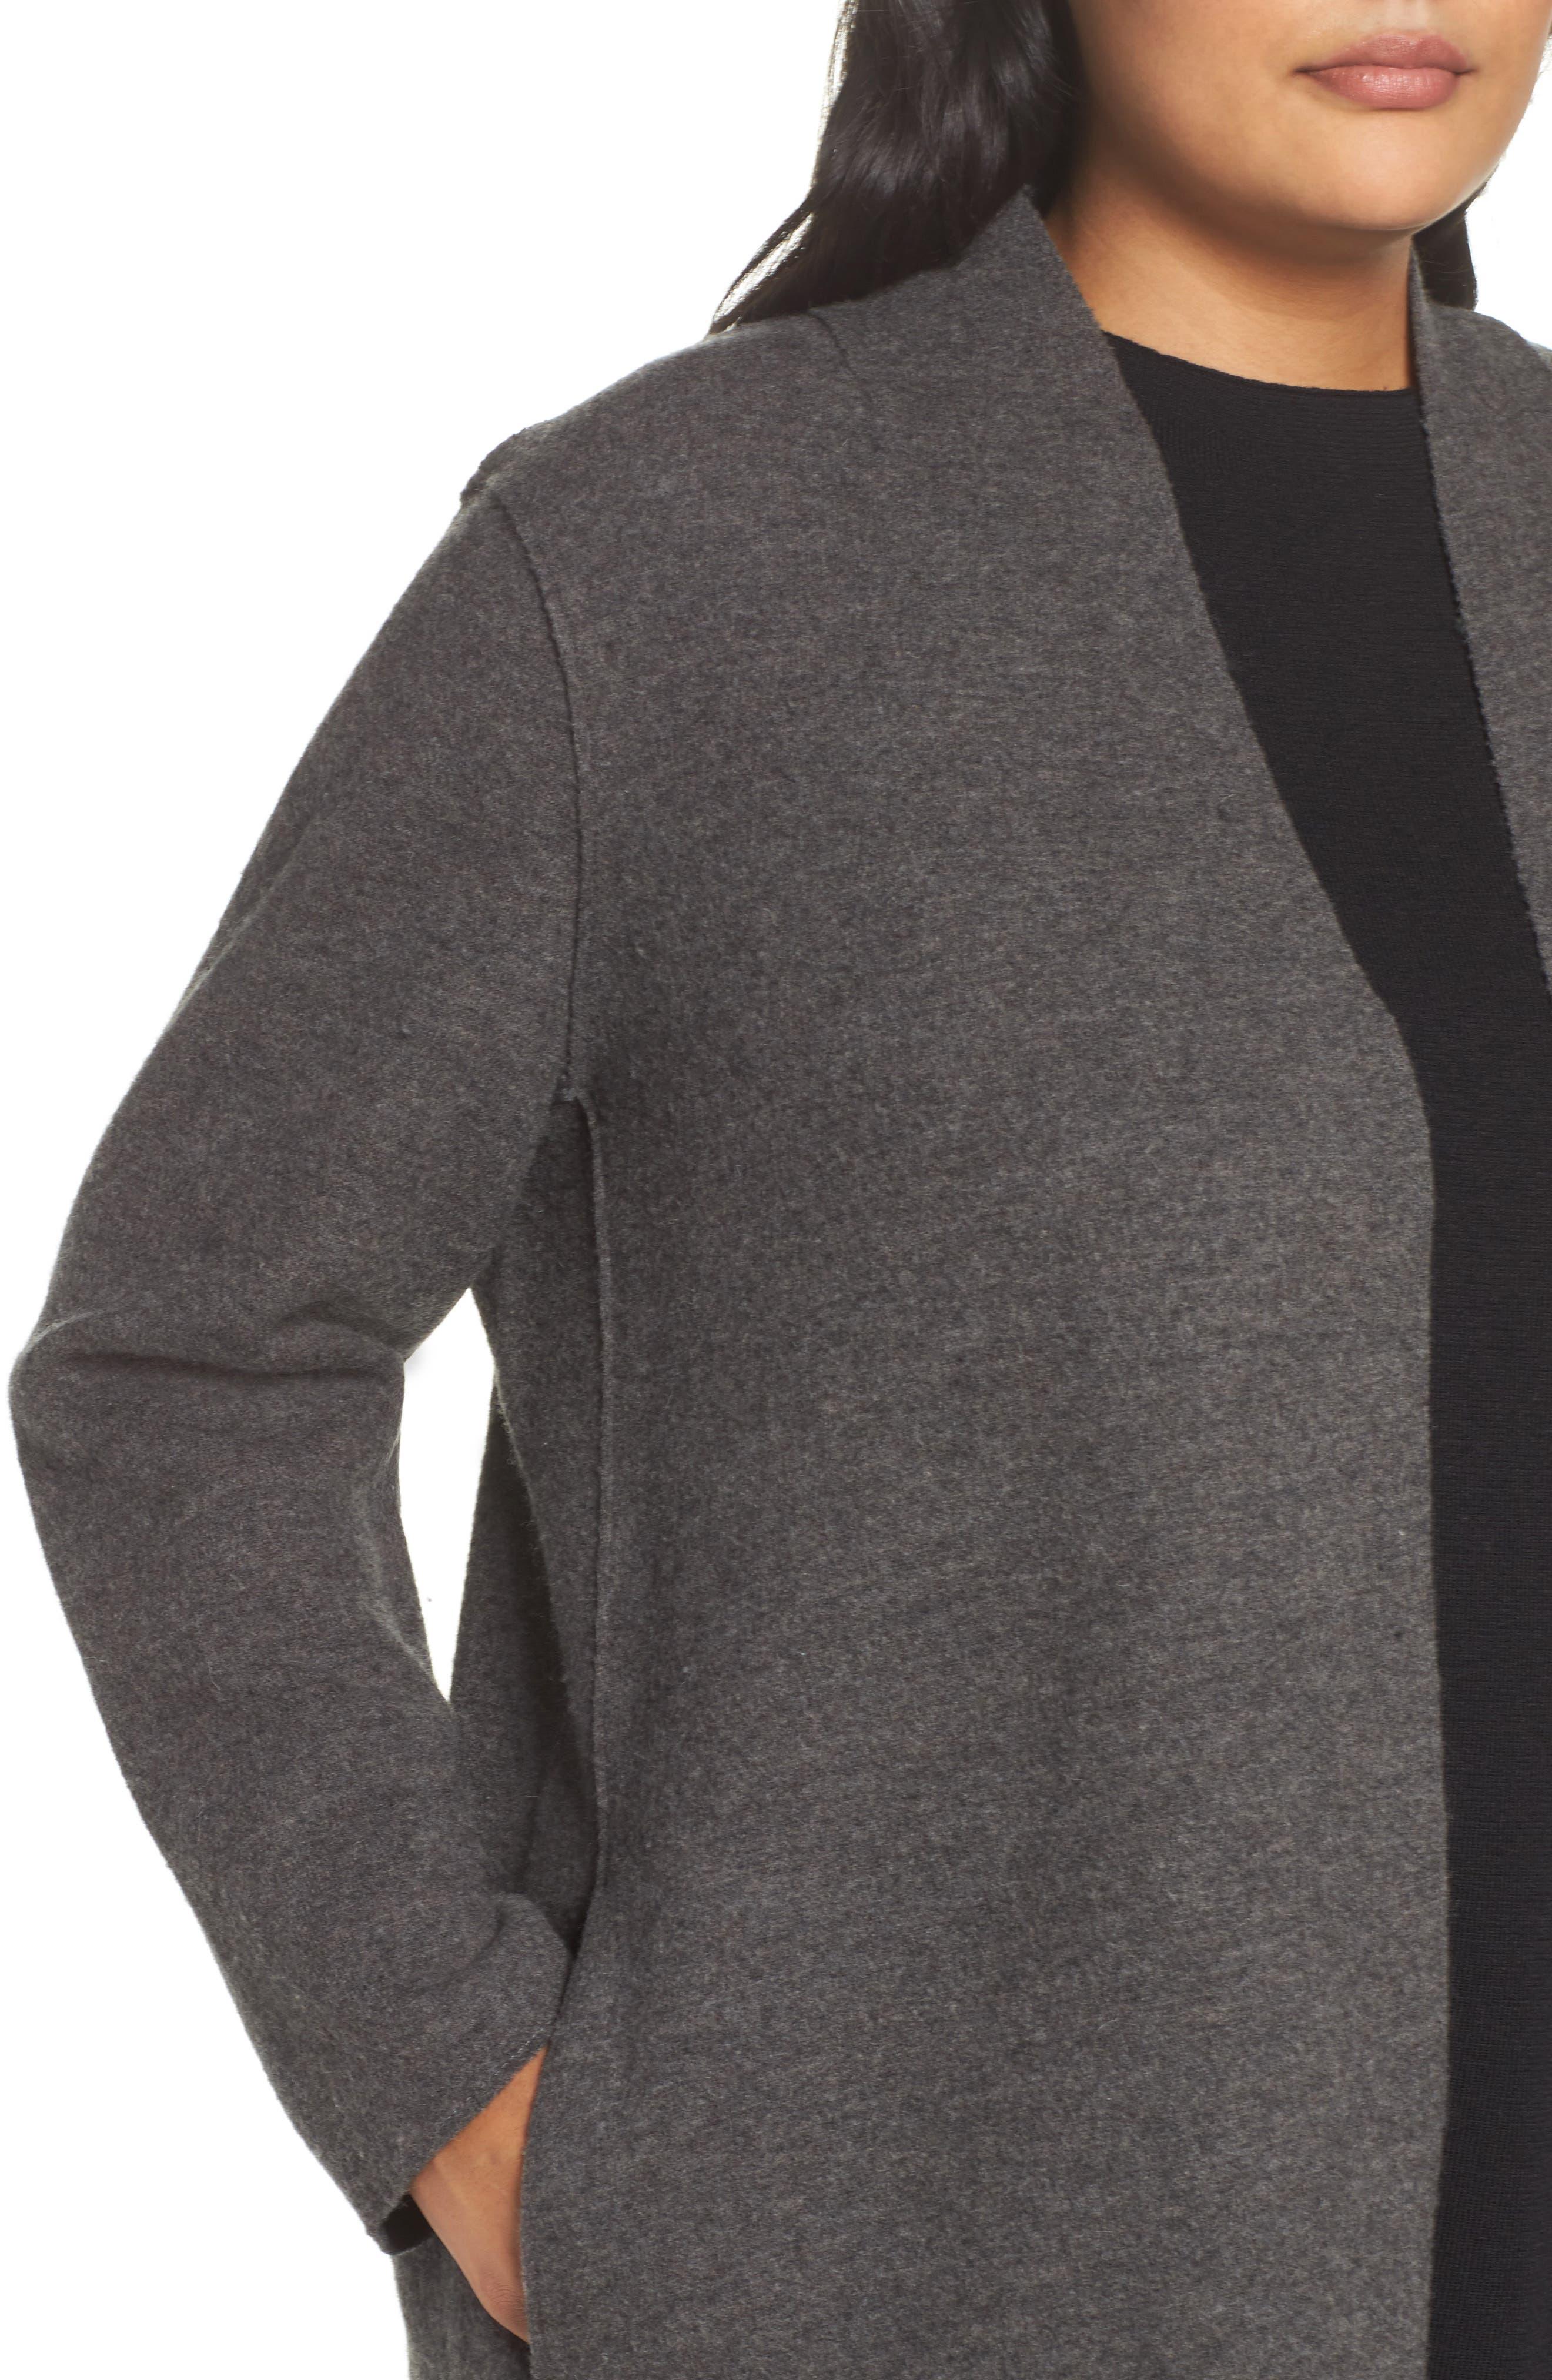 Boiled Wool Jacket,                             Alternate thumbnail 7, color,